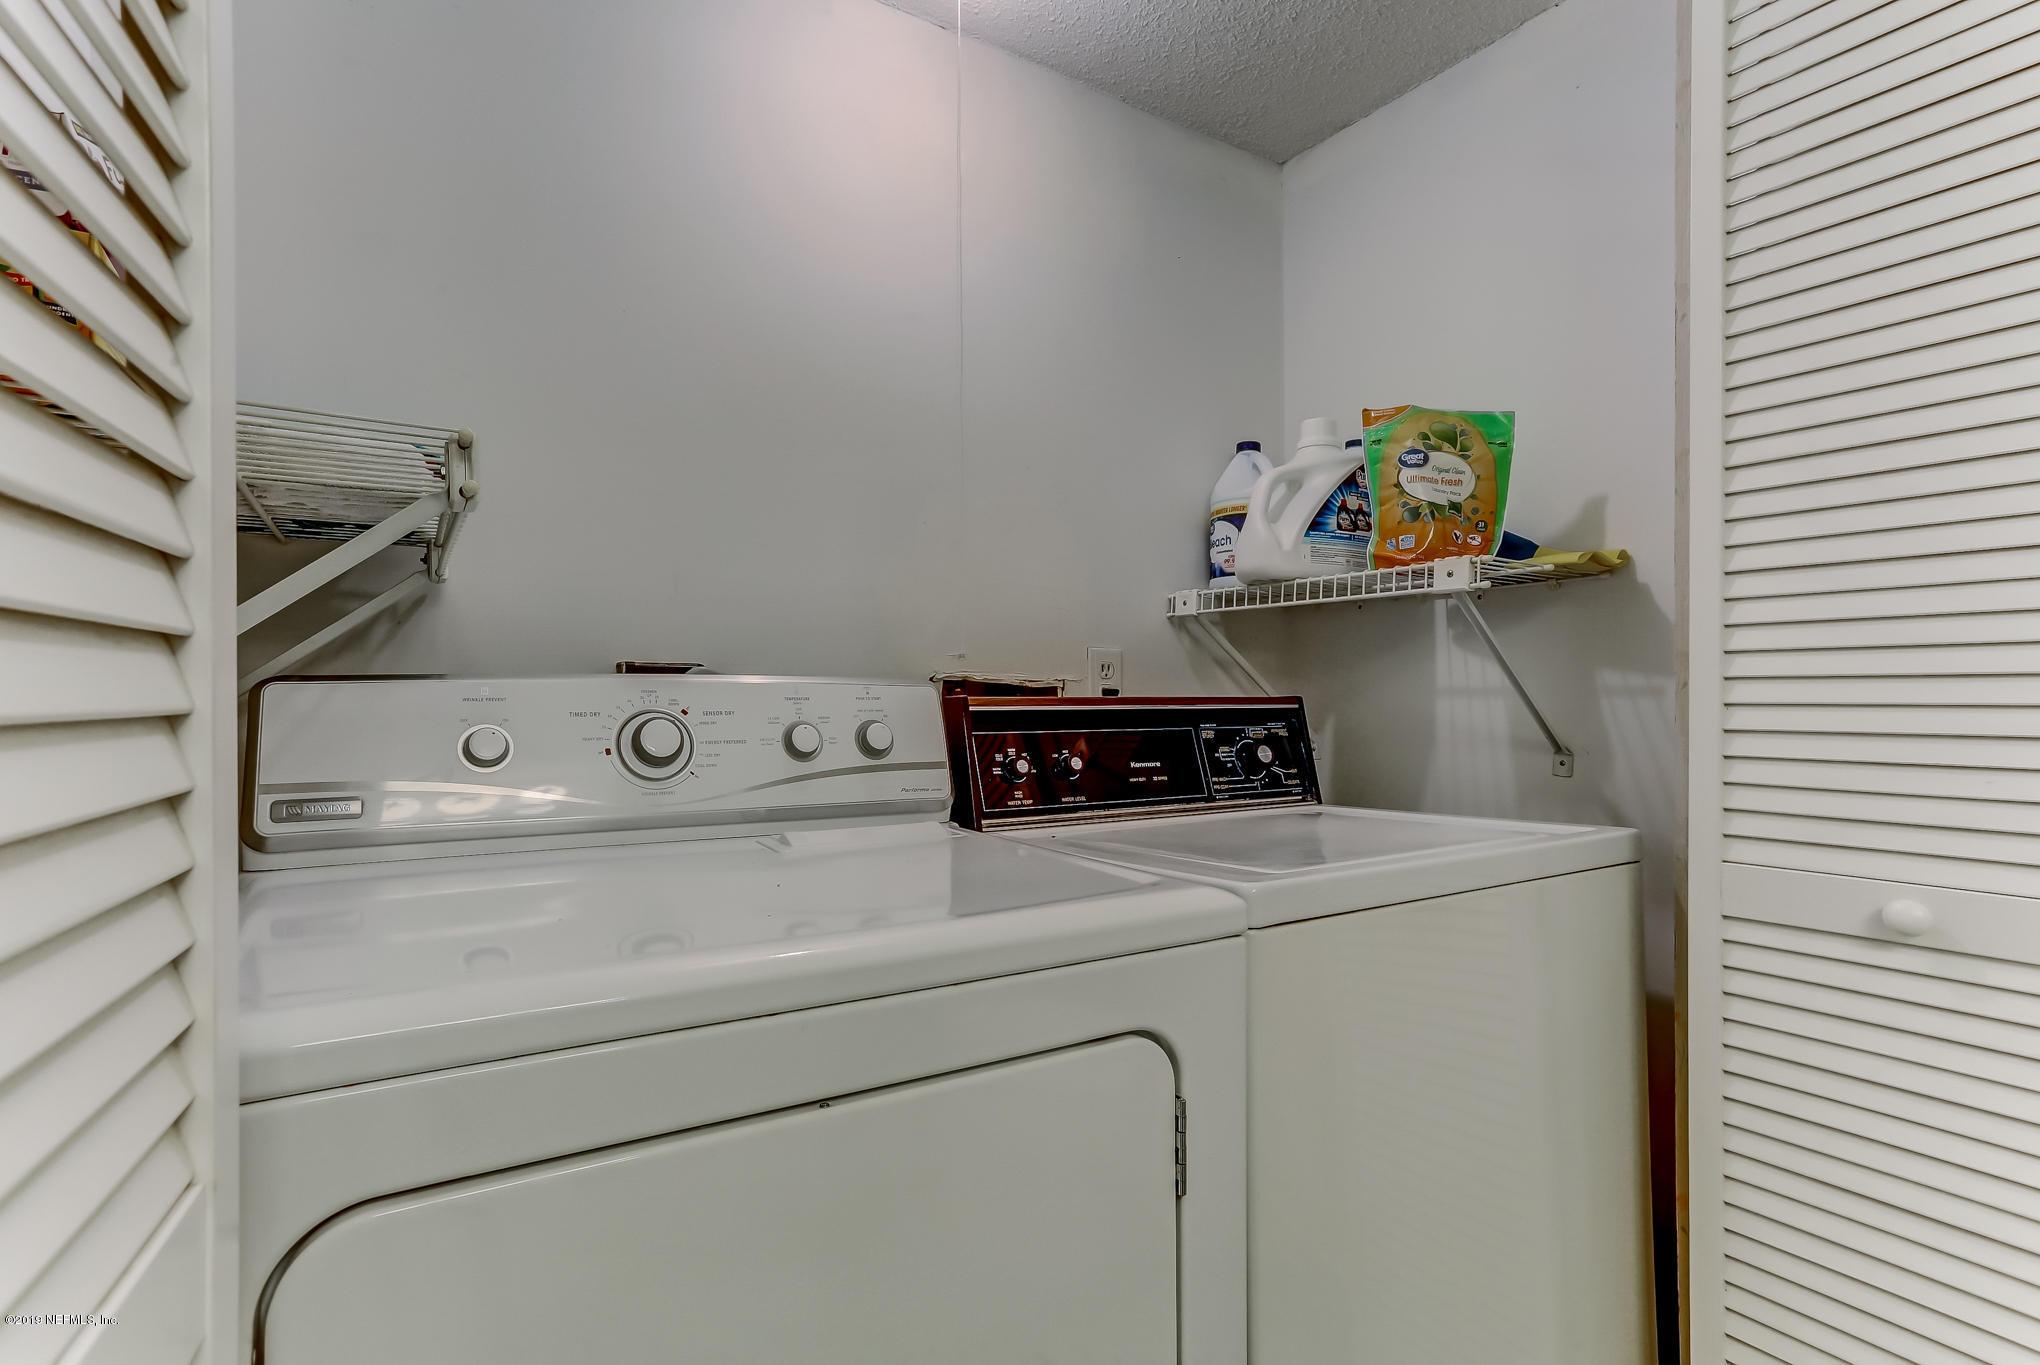 631 TARPON, FERNANDINA BEACH, FLORIDA 32034, 2 Bedrooms Bedrooms, ,1 BathroomBathrooms,Condo,For sale,TARPON,1014491